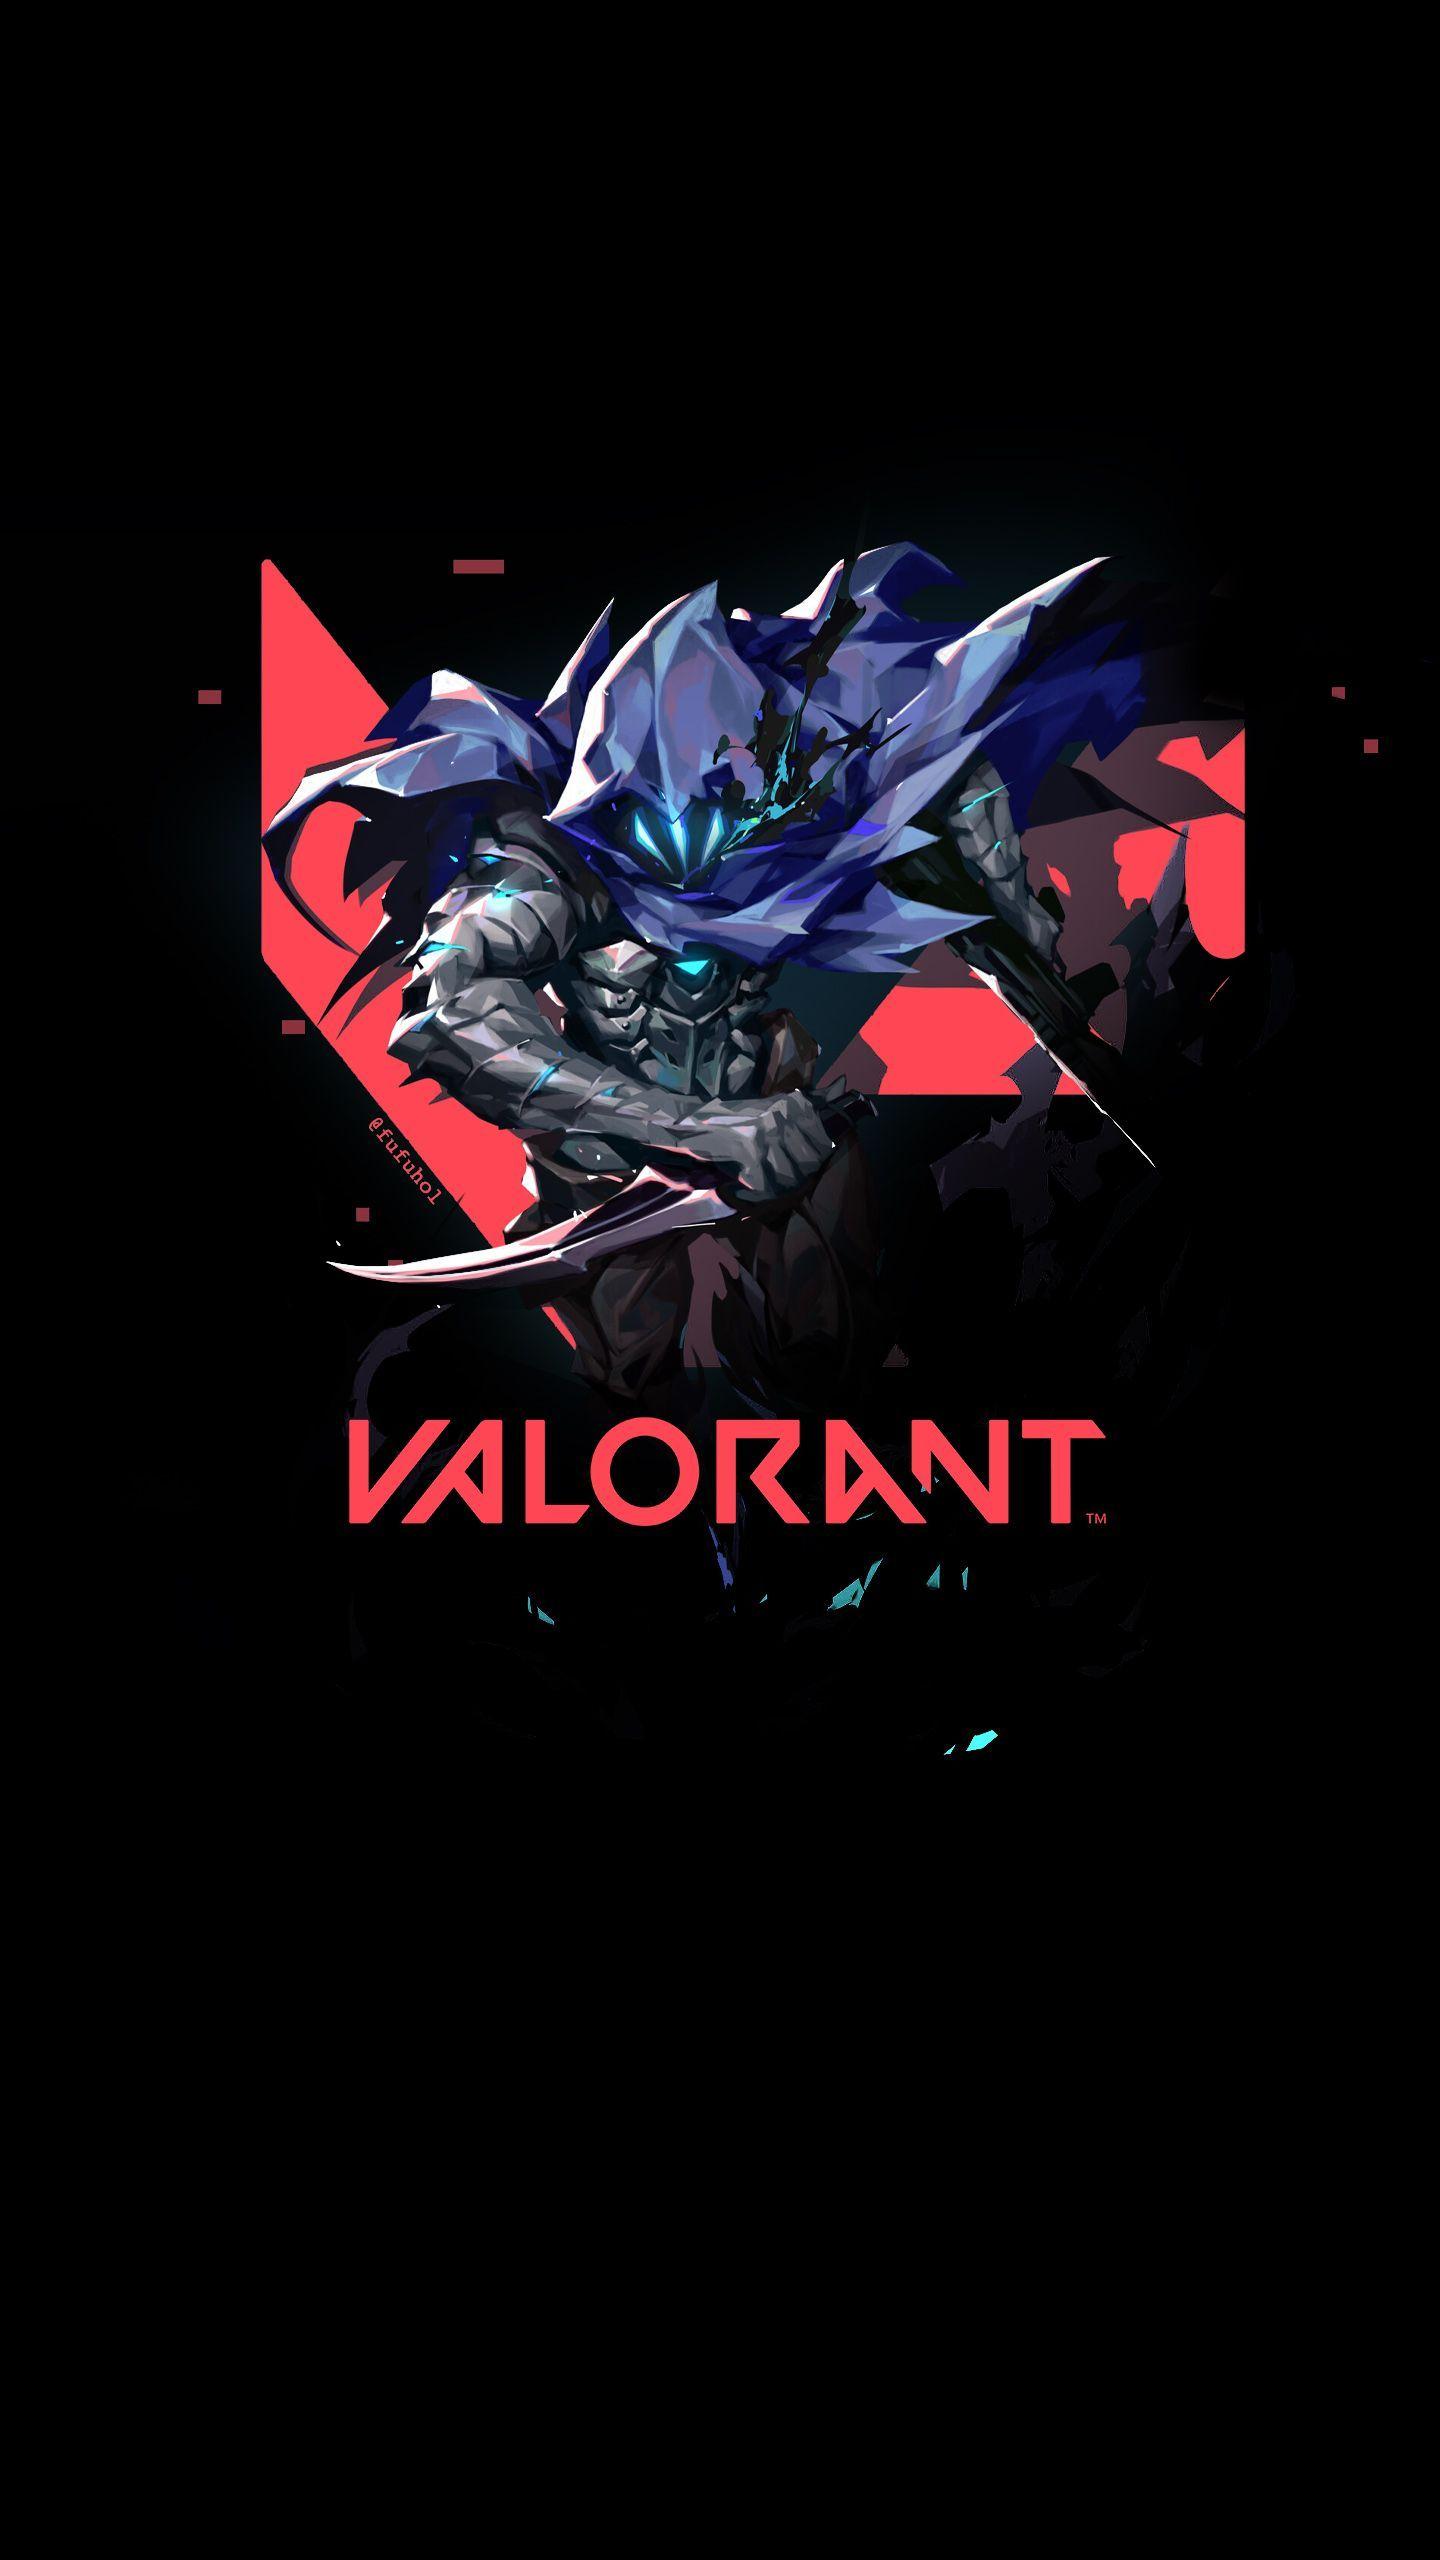 Desktop Valorant Wallpaper Discover More Developed Hero Marksman Microsoft Valorant Video Games Wallpaper In 2021 Phone Wallpaper Game Character Design Wallpaper